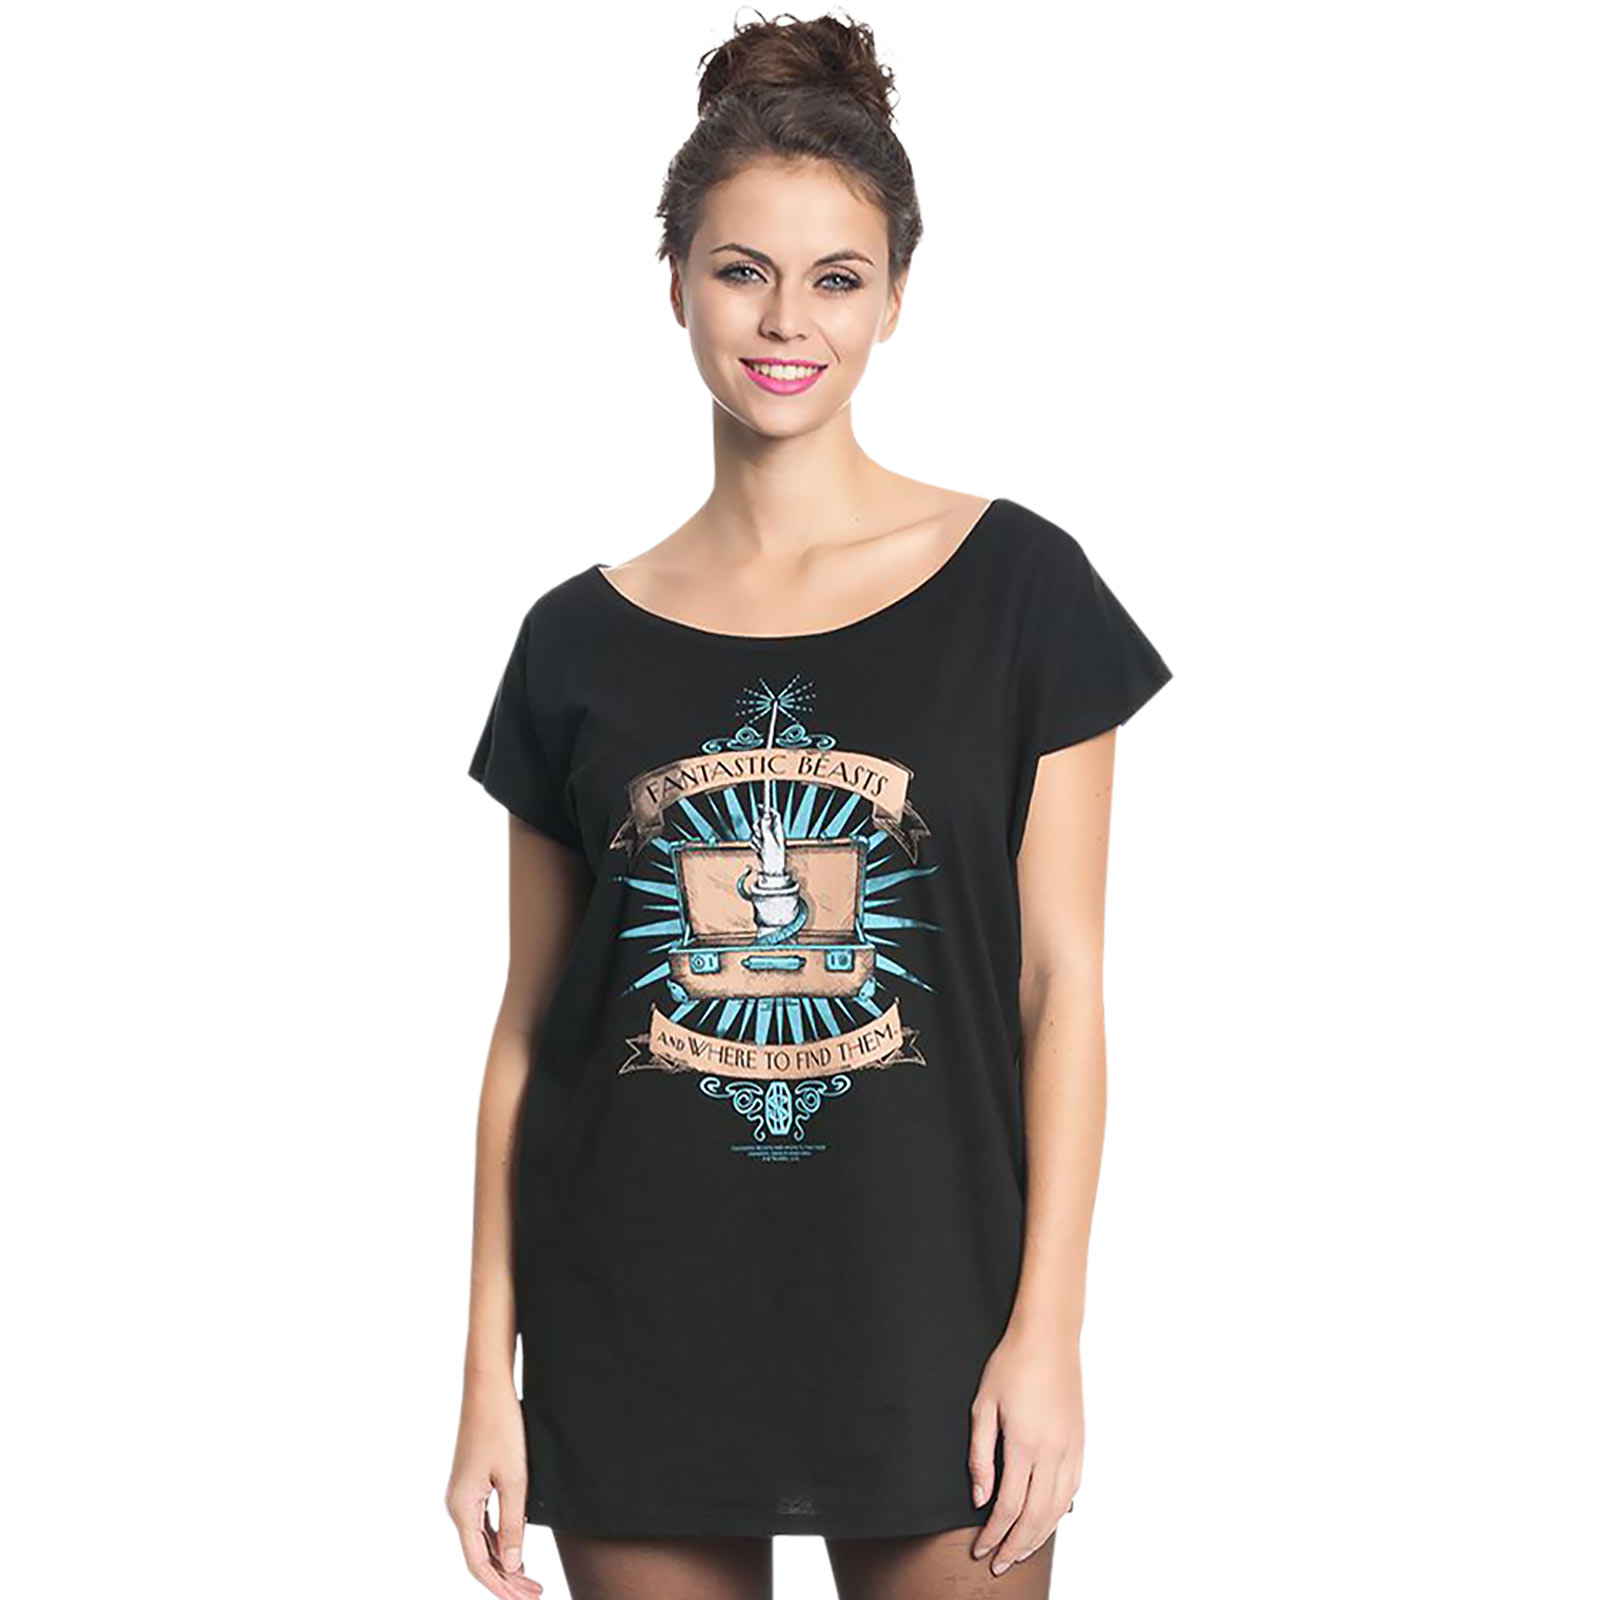 Magic - Phantastische Tierwesen Girlie Shirt Loose Fit